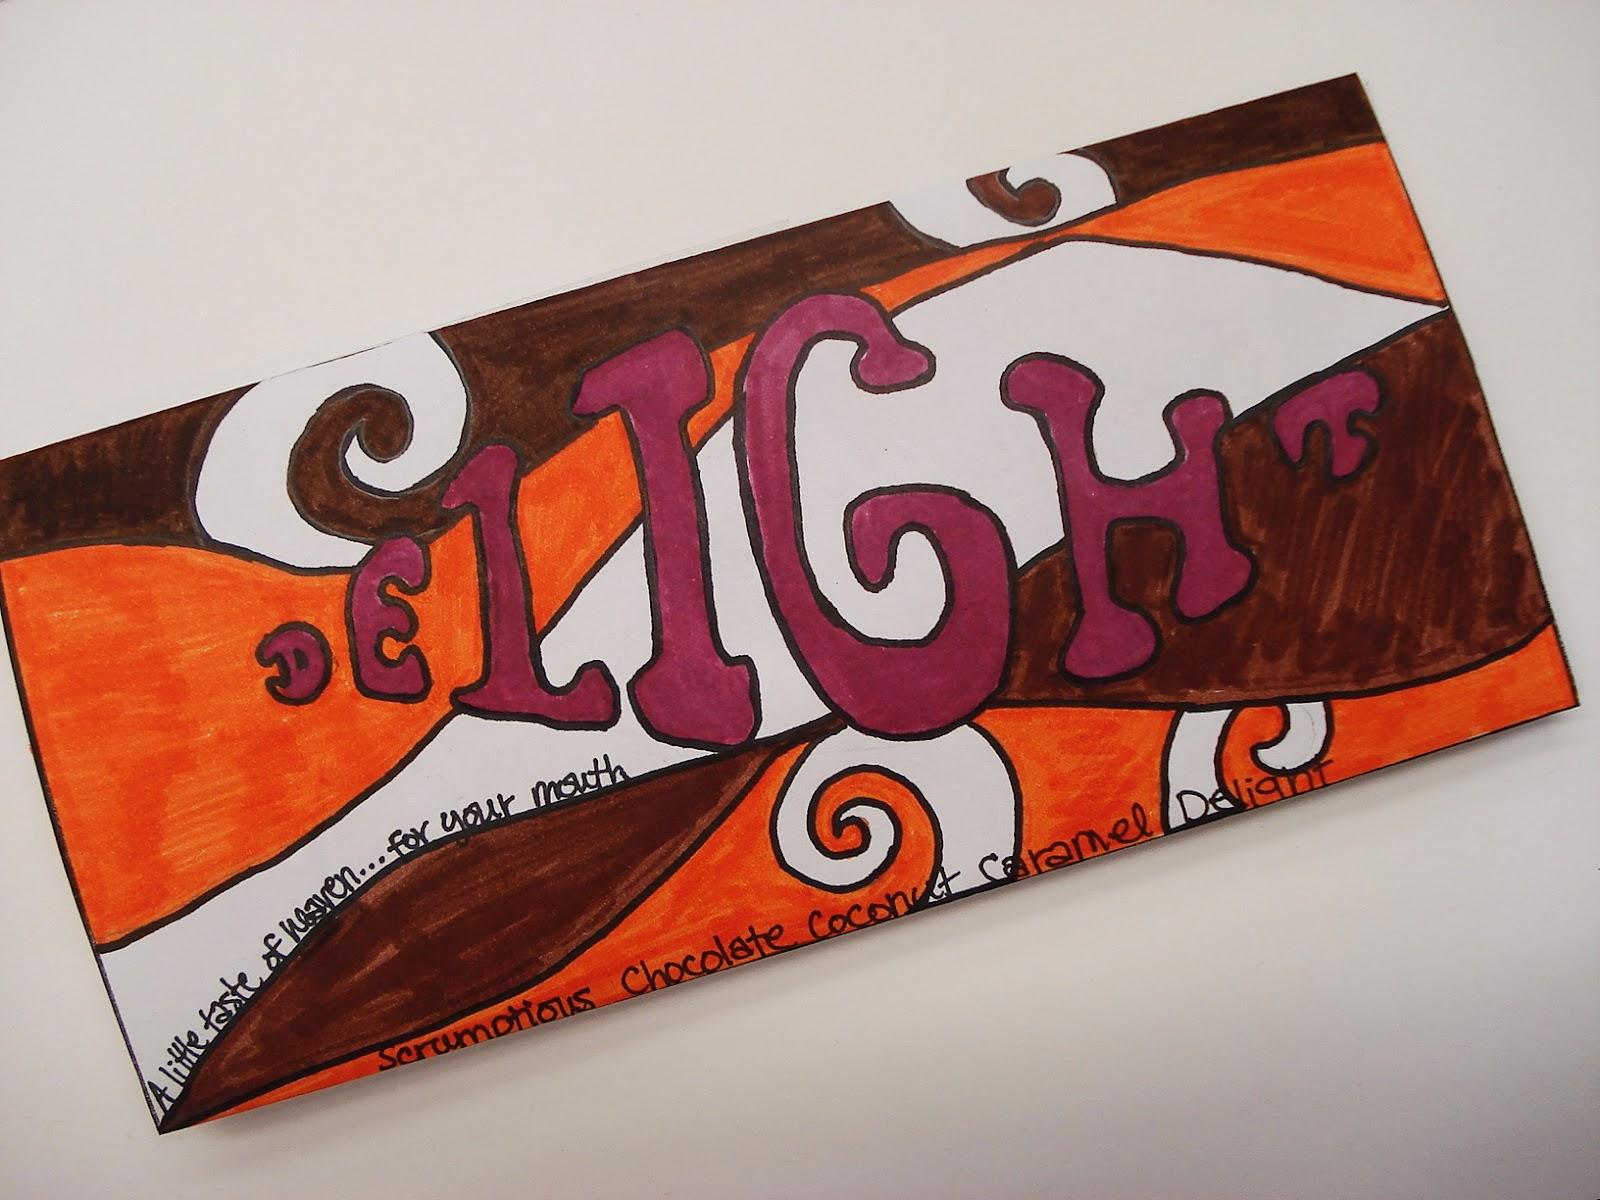 A Faithful Attempt Chocolate Bar Wrapper Design